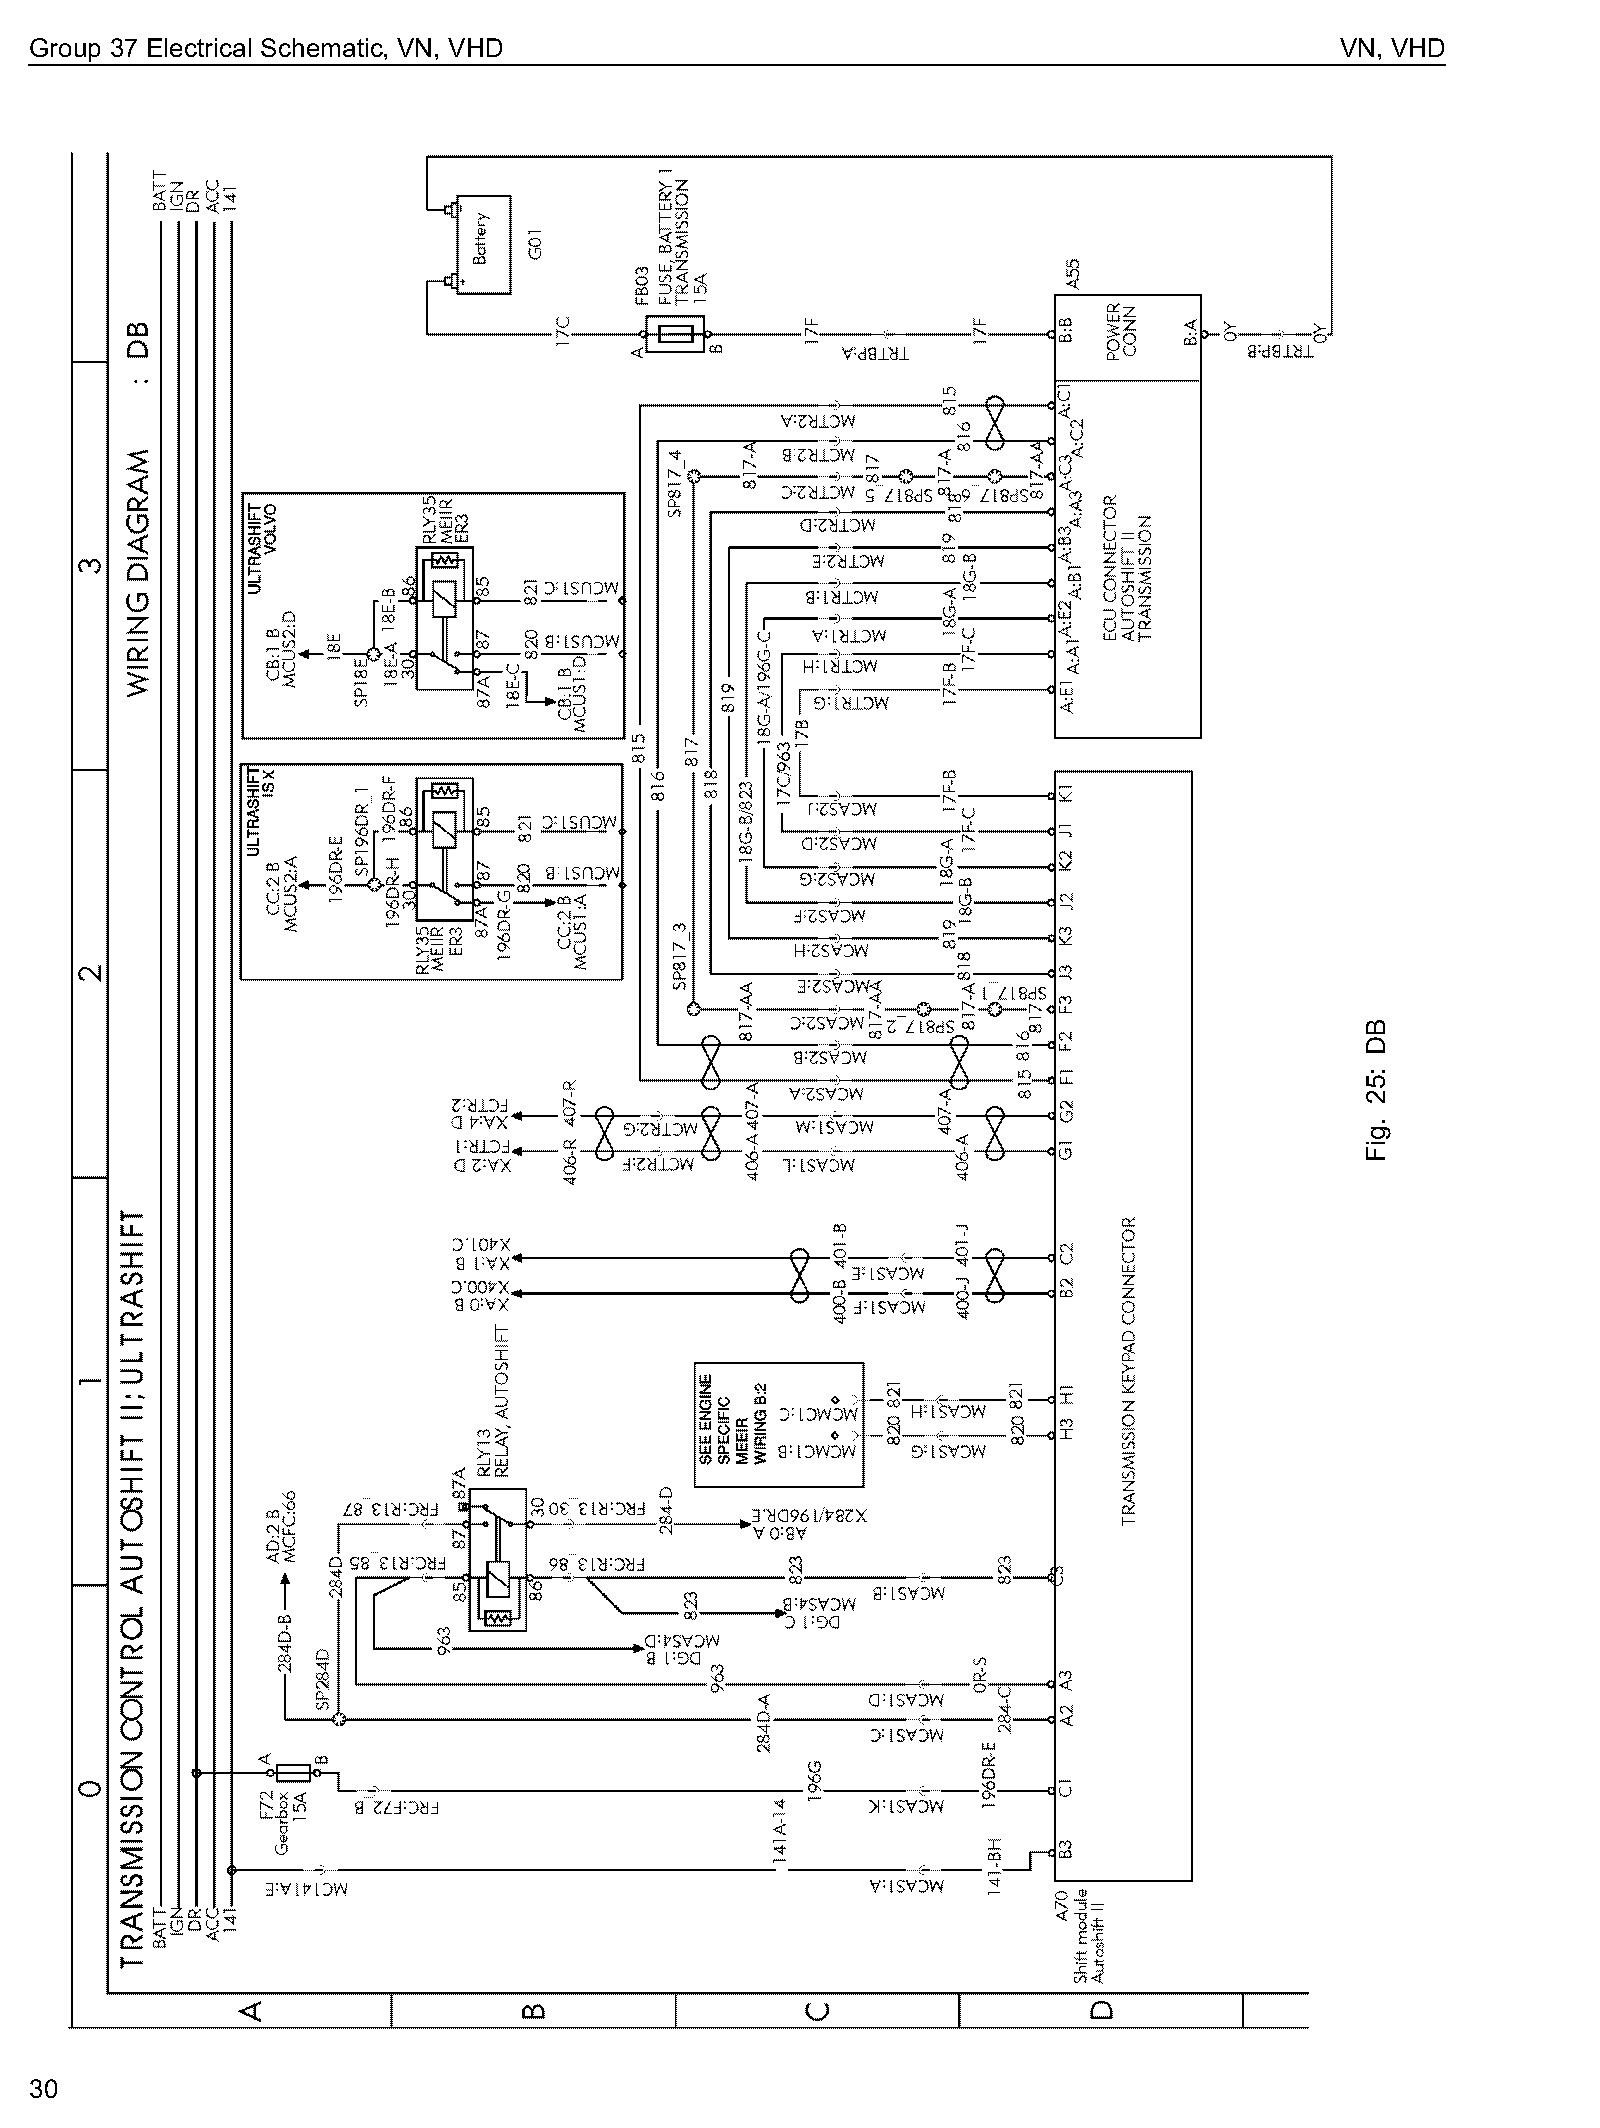 Volvo Truck Wg64t Wiring Diagrams - Diagram Wiring Club last-mutter -  last-mutter.pavimentazionisgarbossavicenza.it | Volvo Truck Wiring Diagram Pdf |  | pavimentazionisgarbossavicenza.it